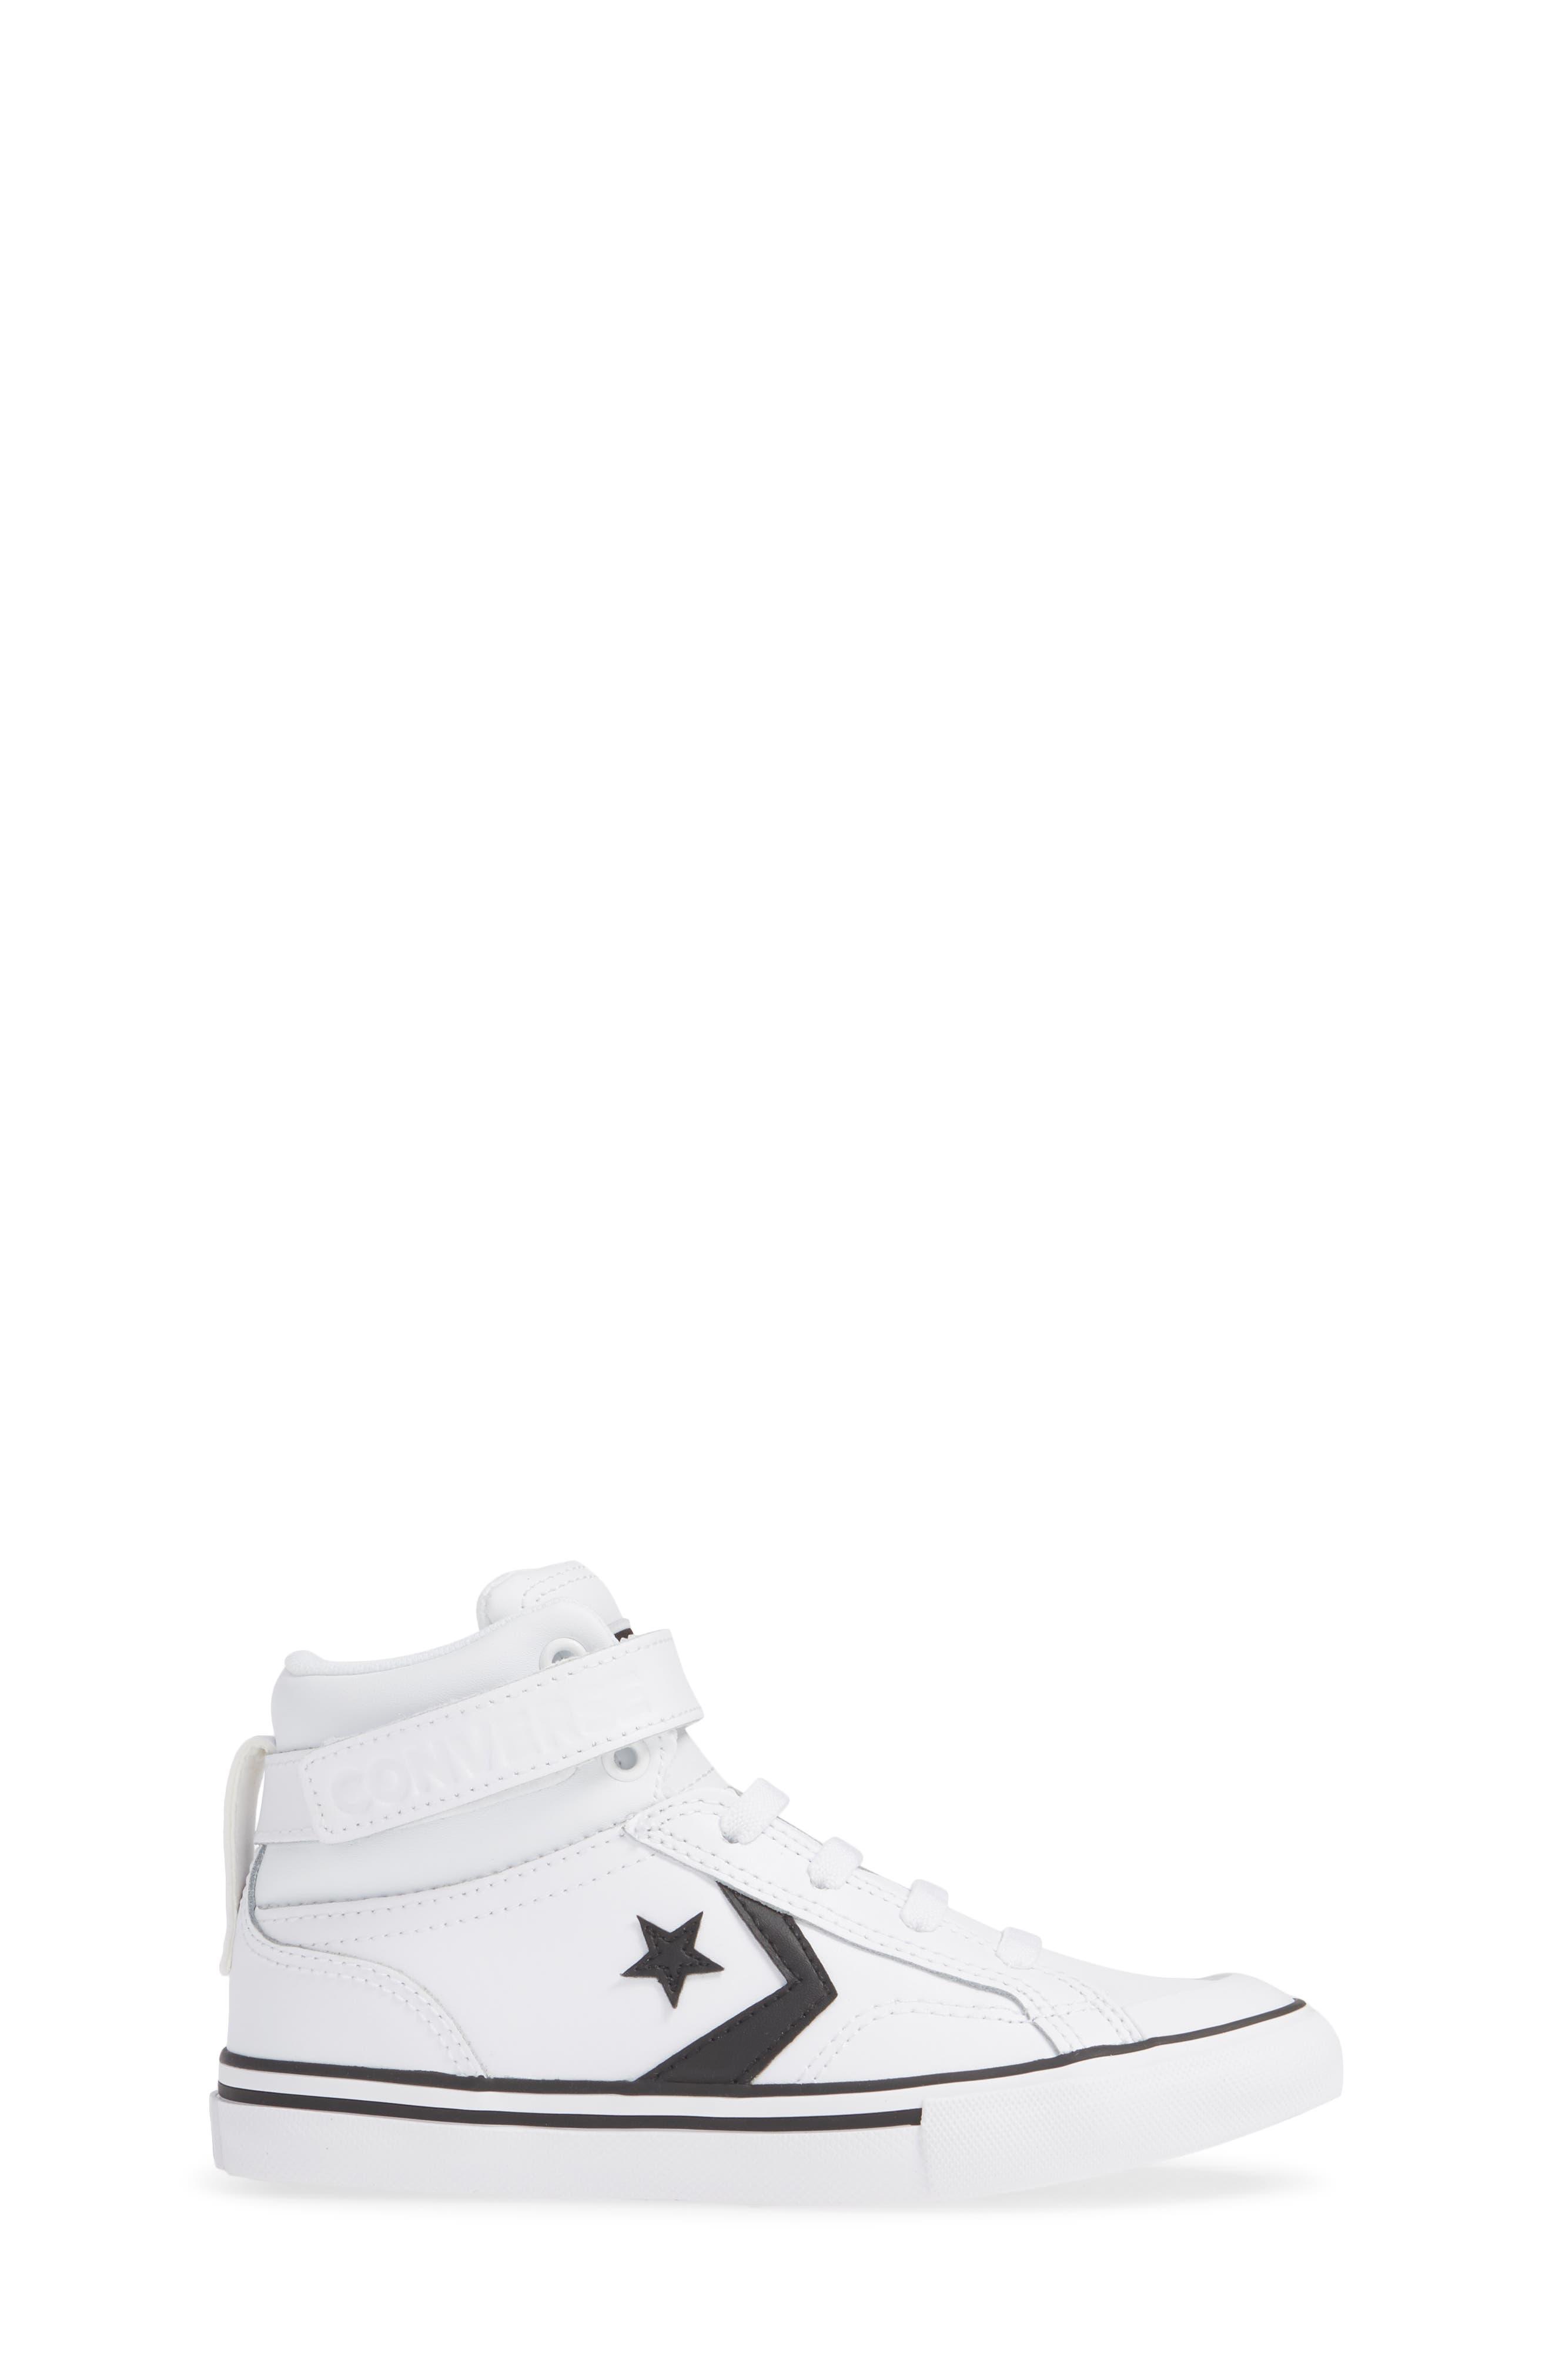 CONVERSE, Pro Blaze High Top Sneaker, Alternate thumbnail 3, color, WHITE/ BLACK/ WHITE